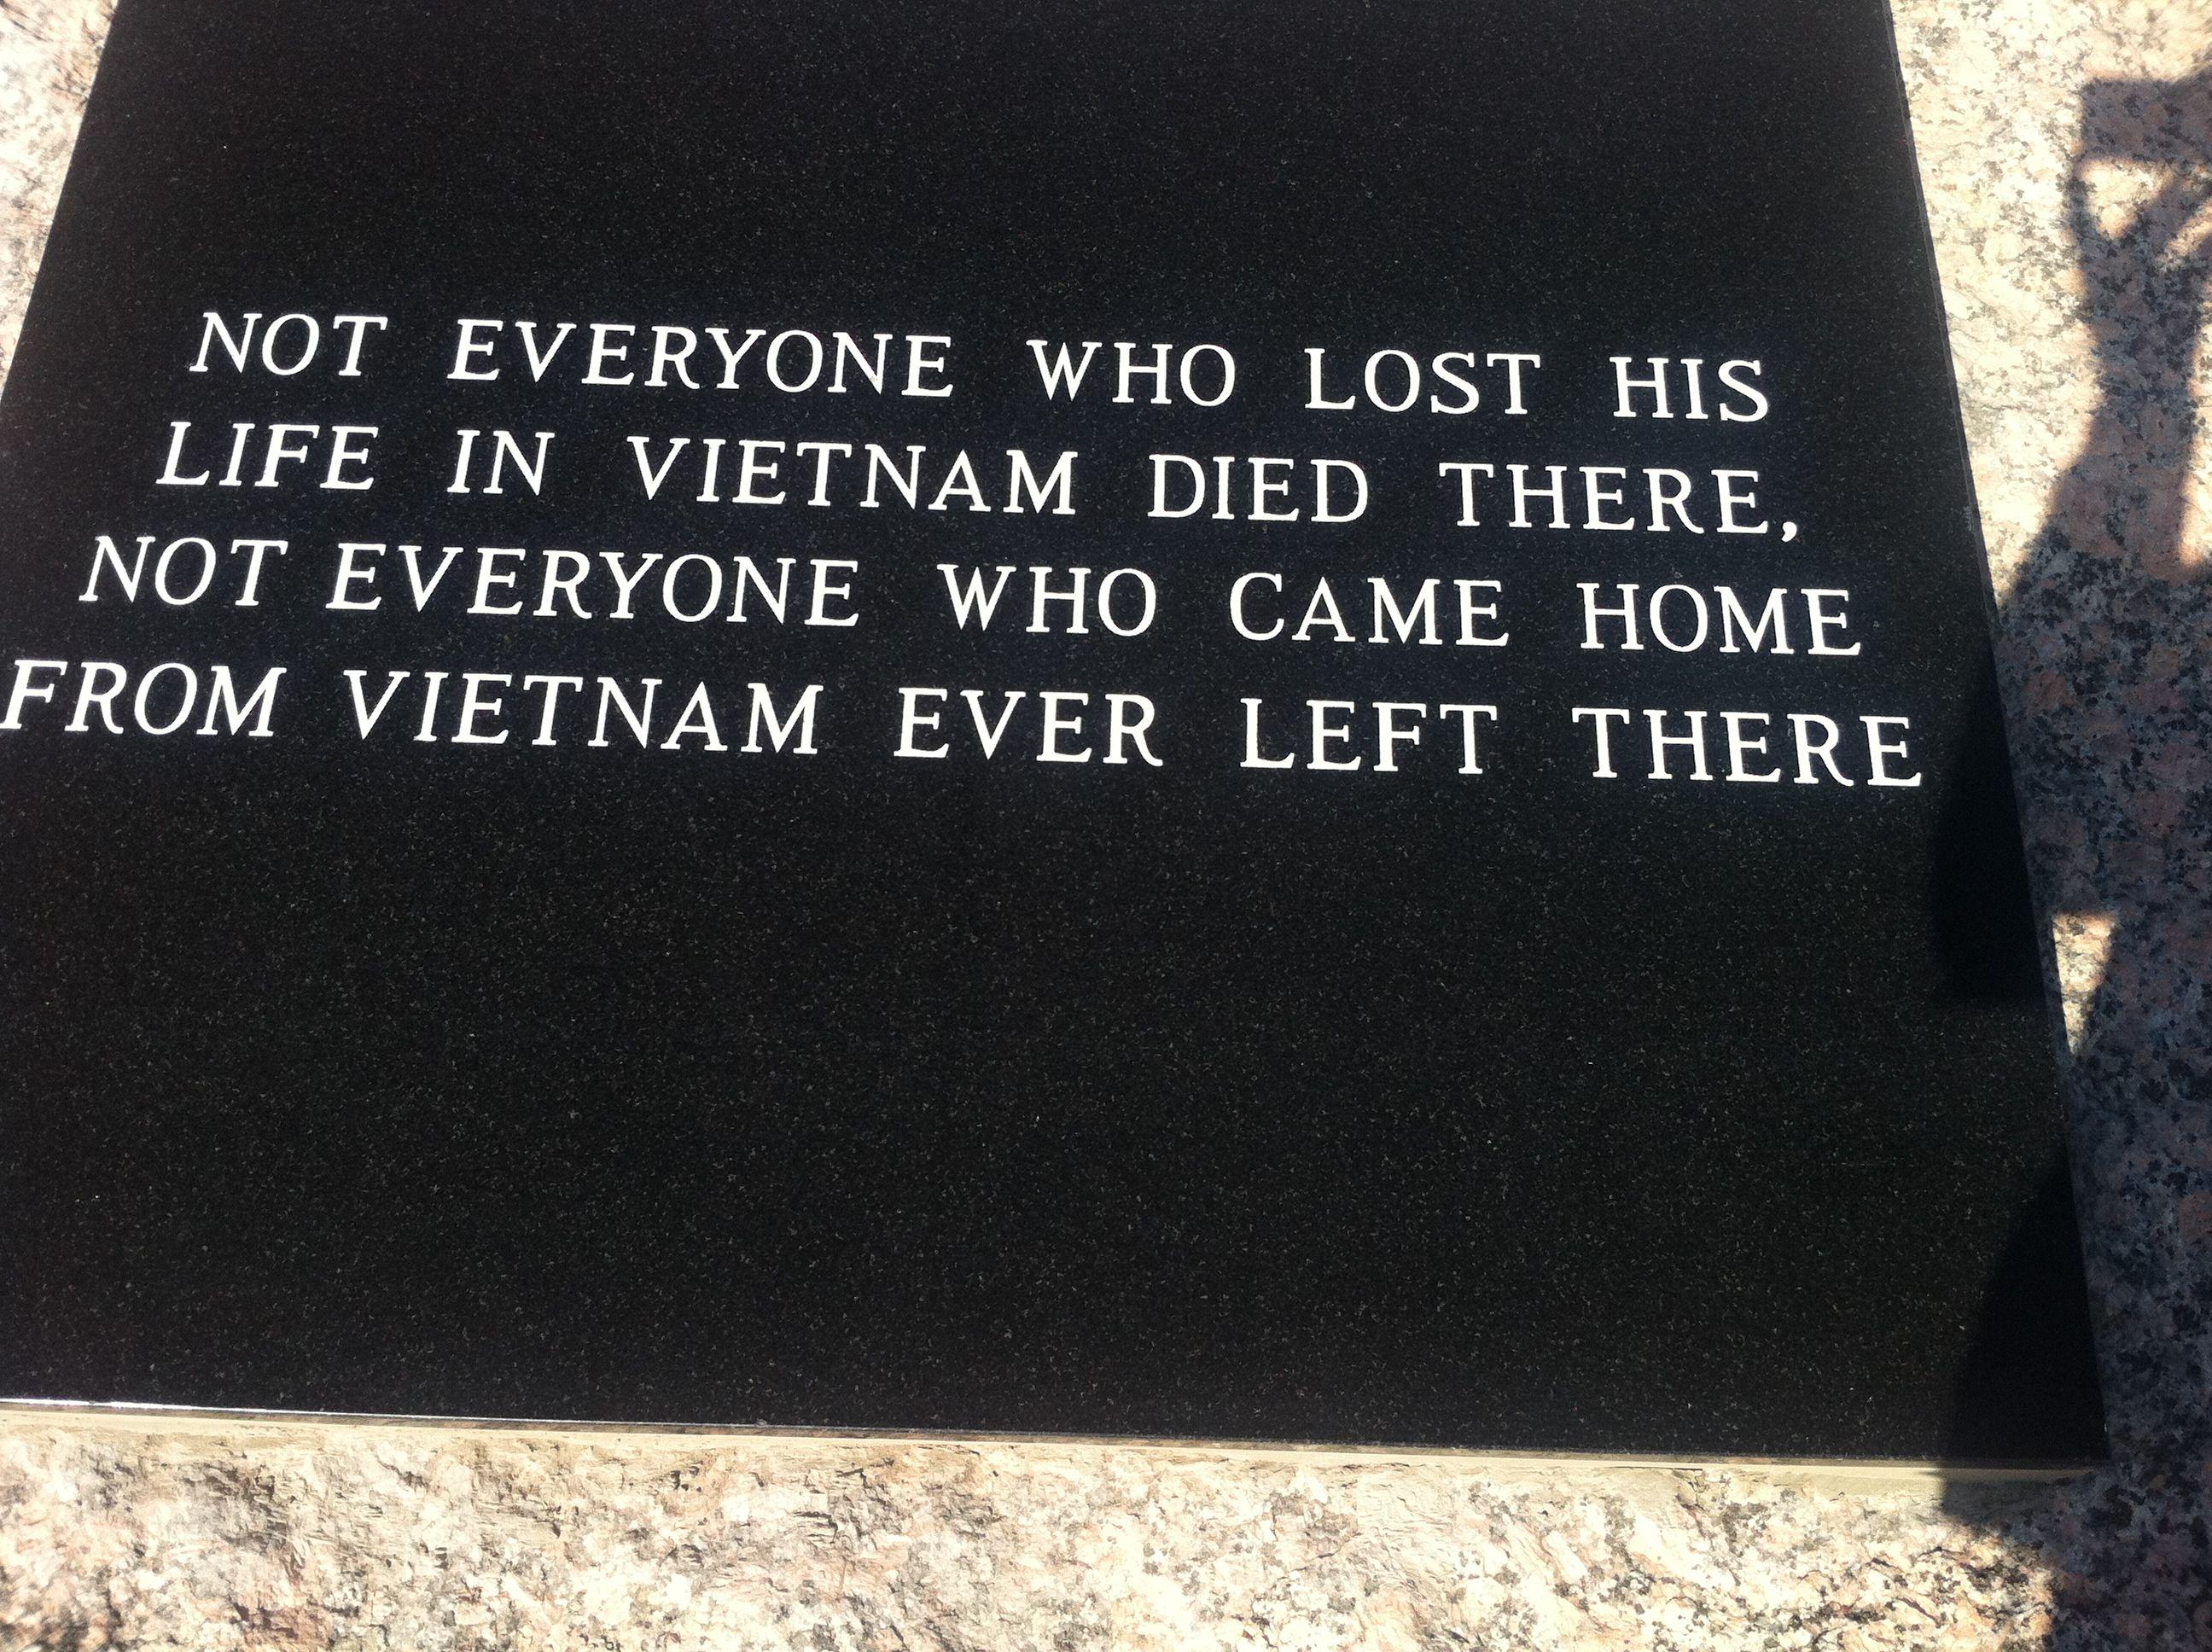 Run For The Wall 2011 Day 4 05 21 2011 Vietnam War Photos Vietnam History Vietnam Vets